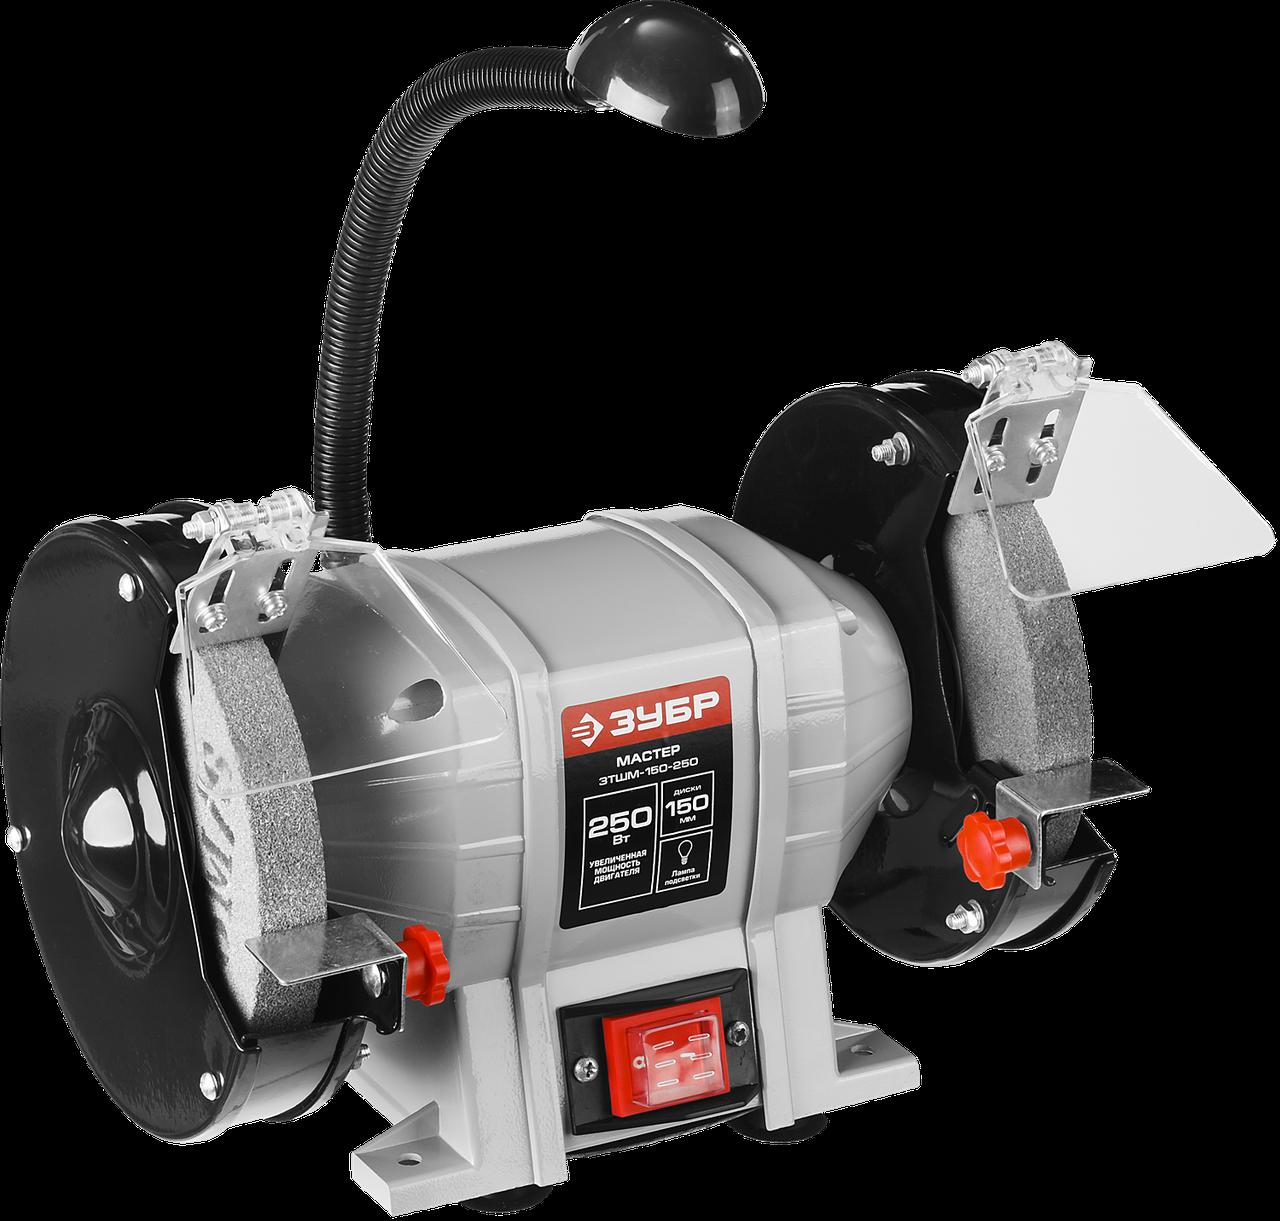 Точило электрическое Зубр ЗТШМ-150-250